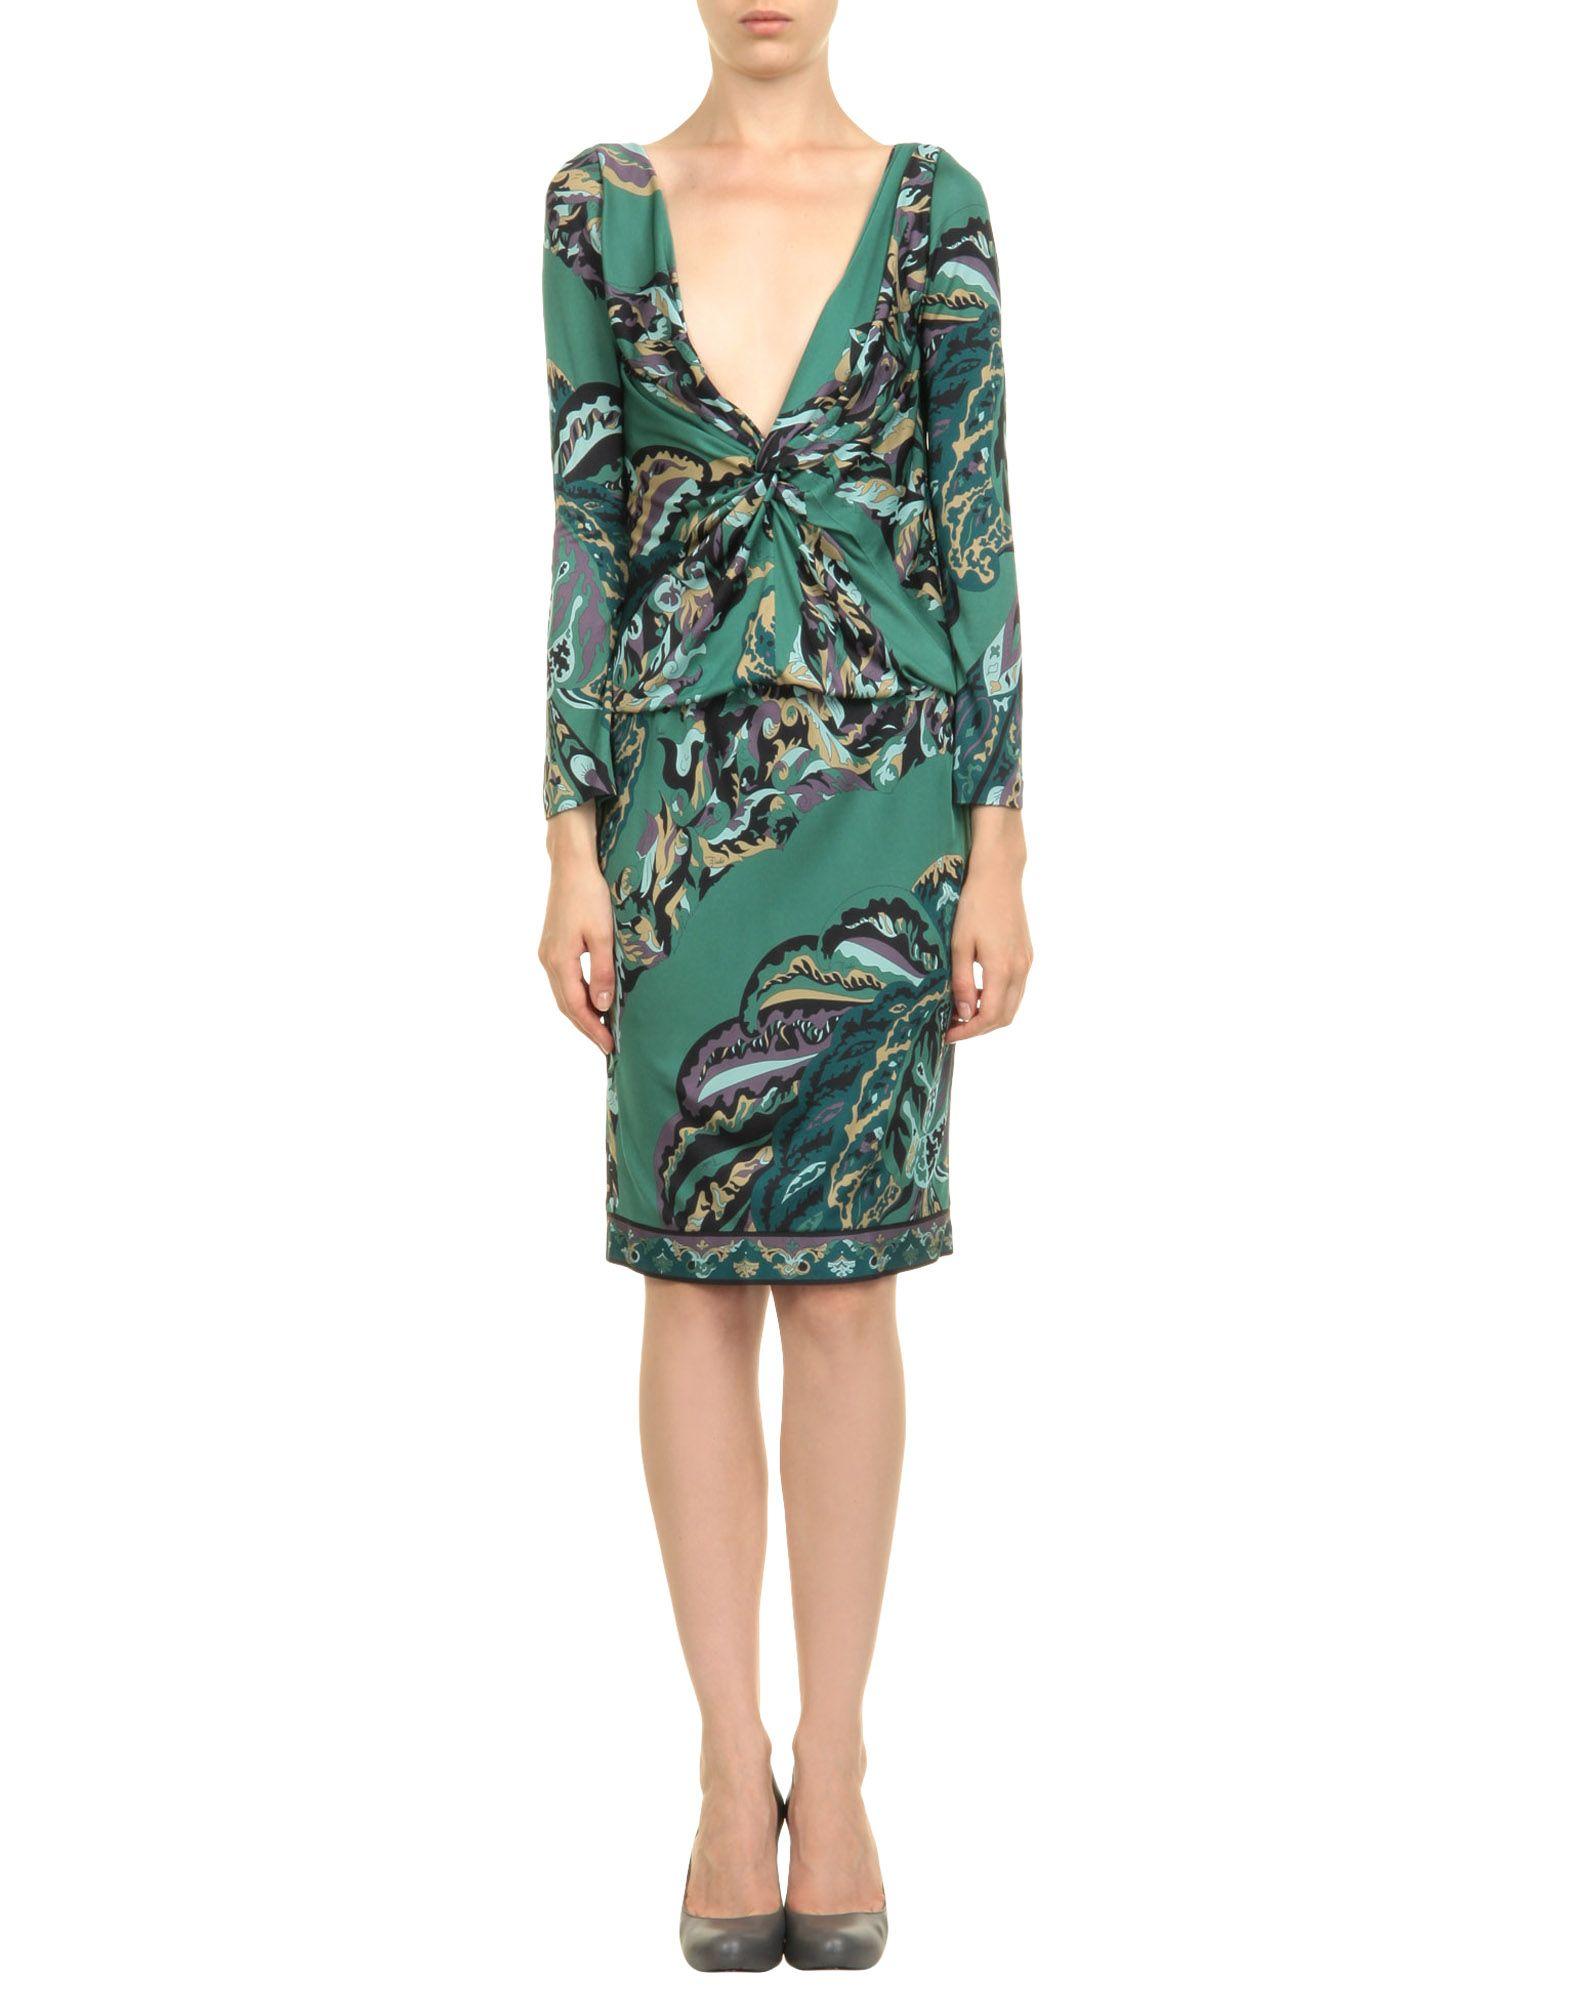 bloomingdale's women's dress suits